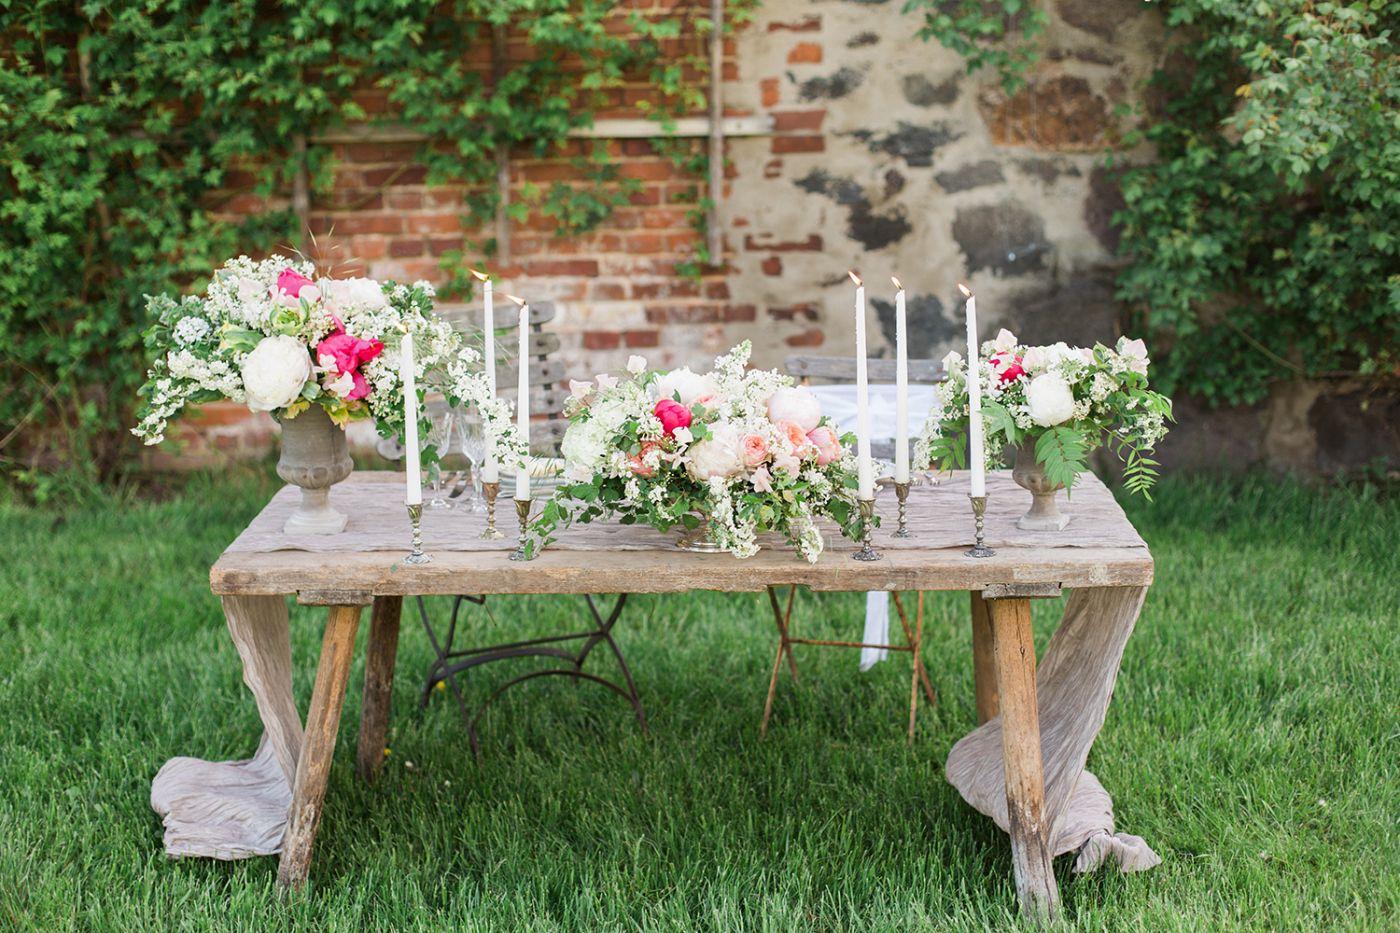 Wedding flowers | Table Centerpiece and Tablerunners | Pinterest ...